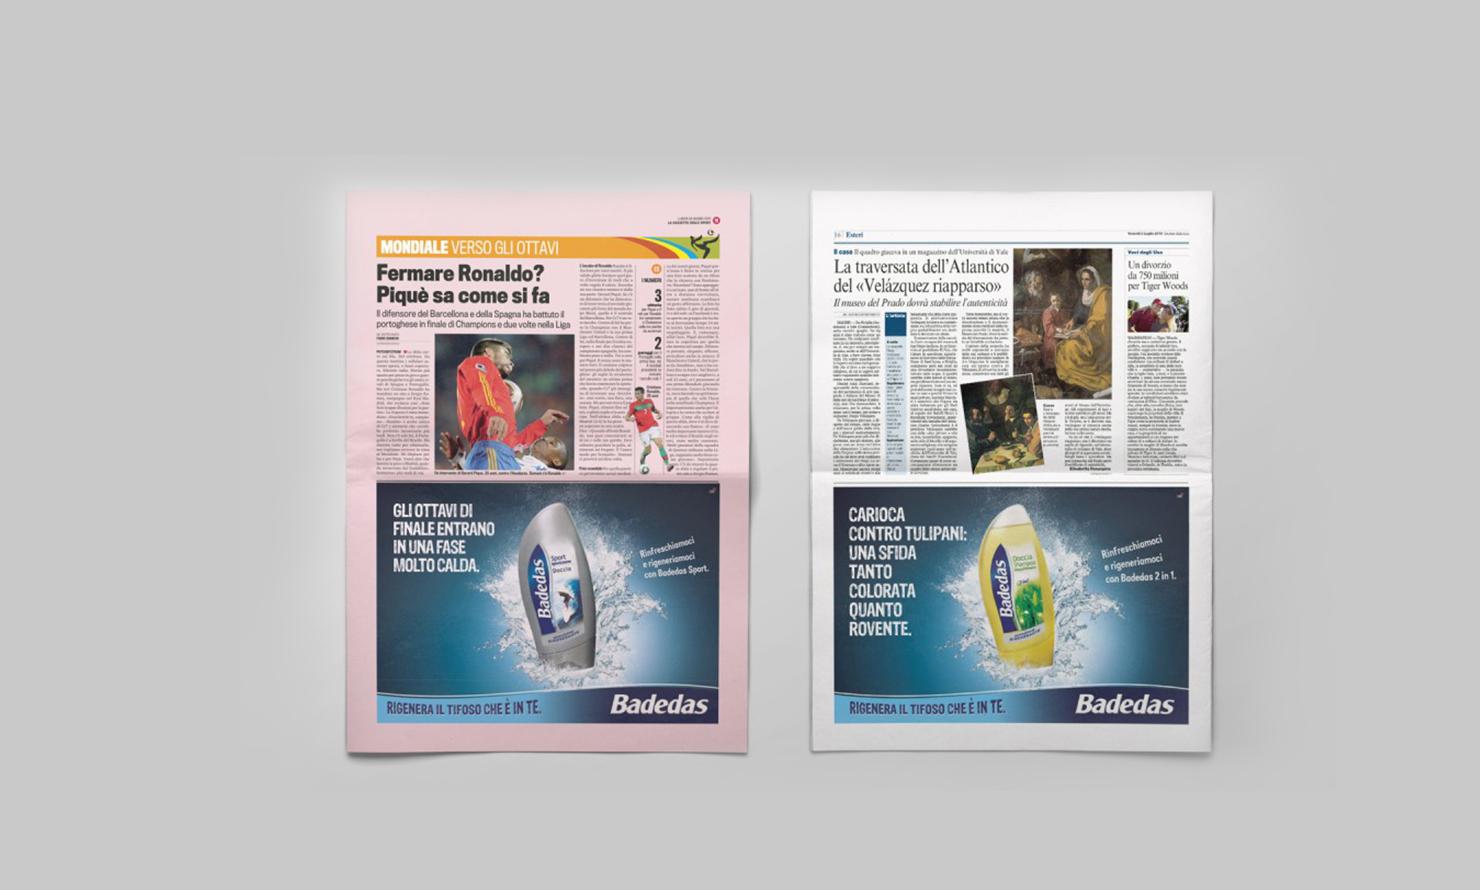 https://www.kubelibre.com/uploads/Slider-work-tutti-clienti/unilever-badedas-rigenera-il-tifoso-che-cè-in-te-2.jpg